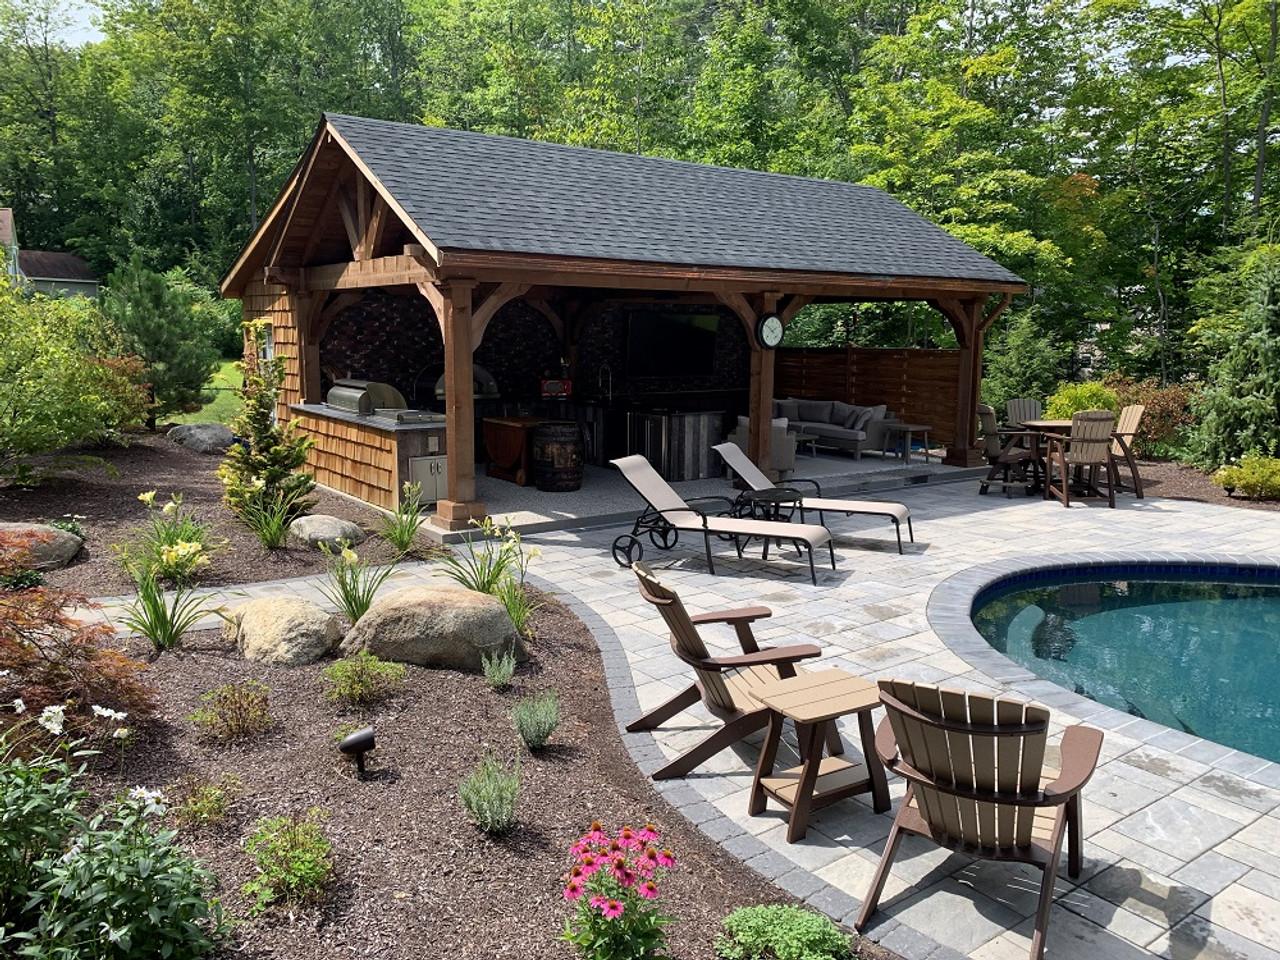 16x28 Grand Cedar Pavilion Kit with Mahogany Stain, Gliford, NH